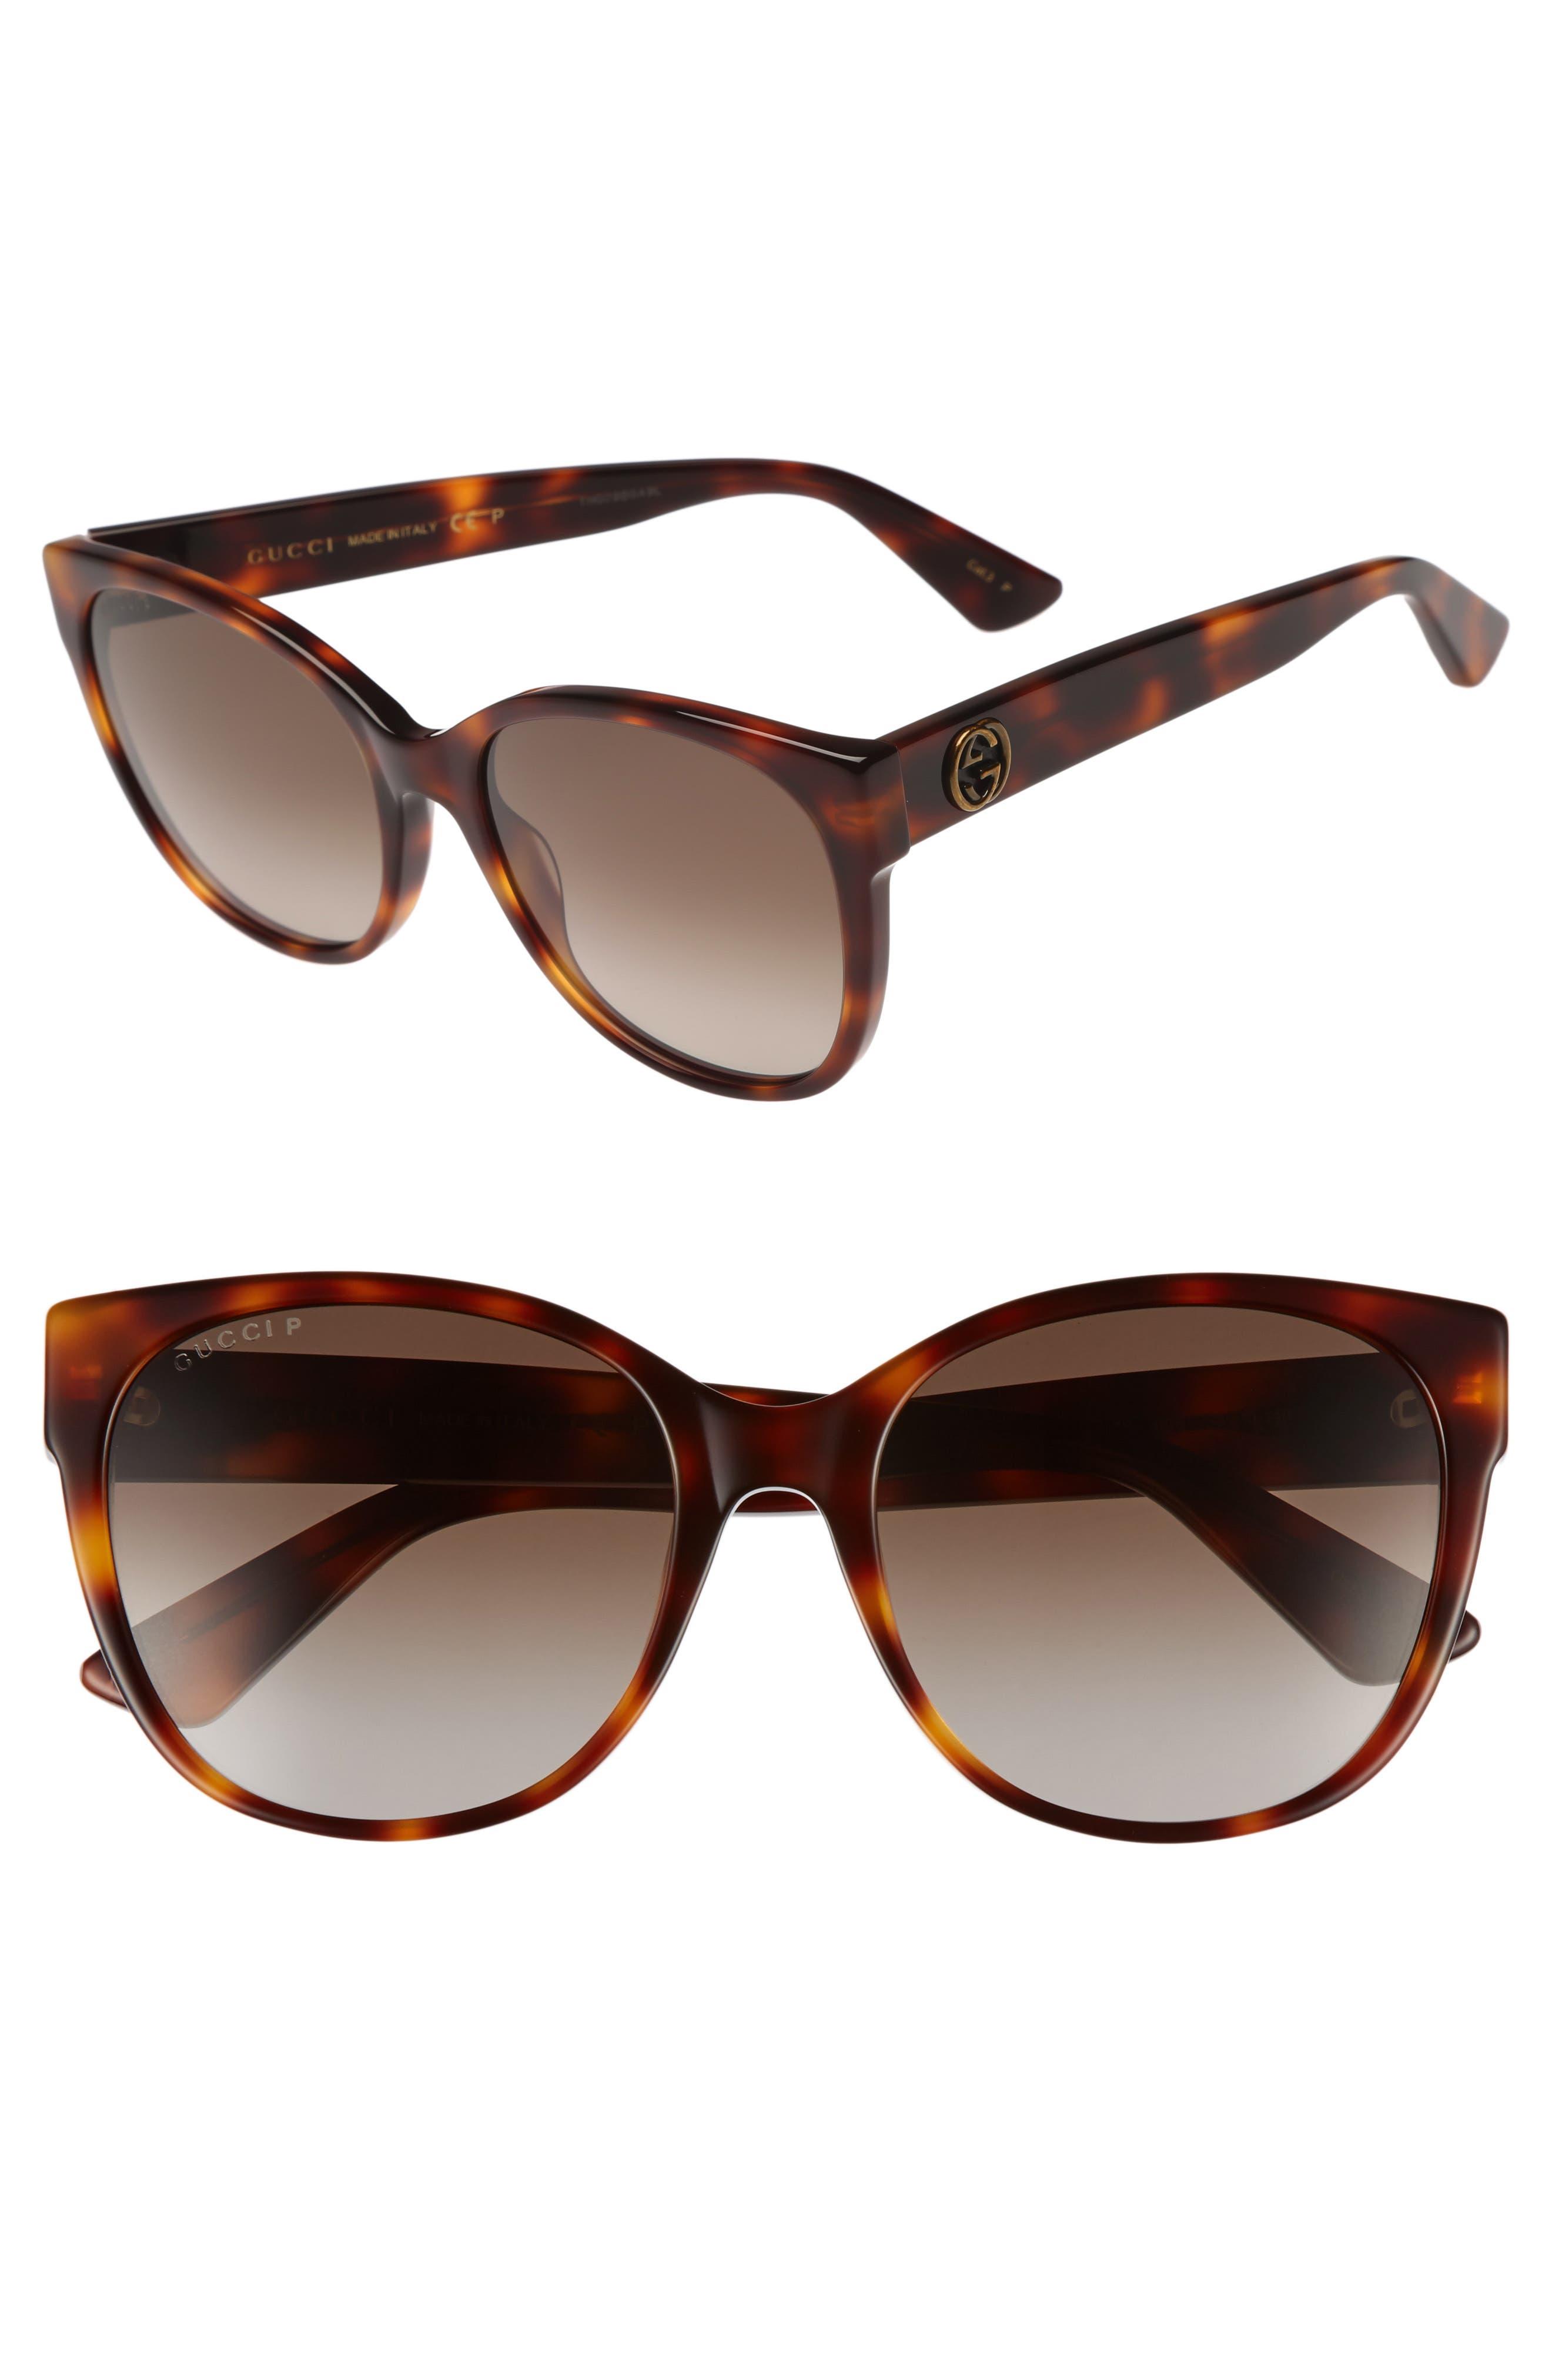 Main Image - Gucci 56mm Polarized Cat Eye Sunglasses